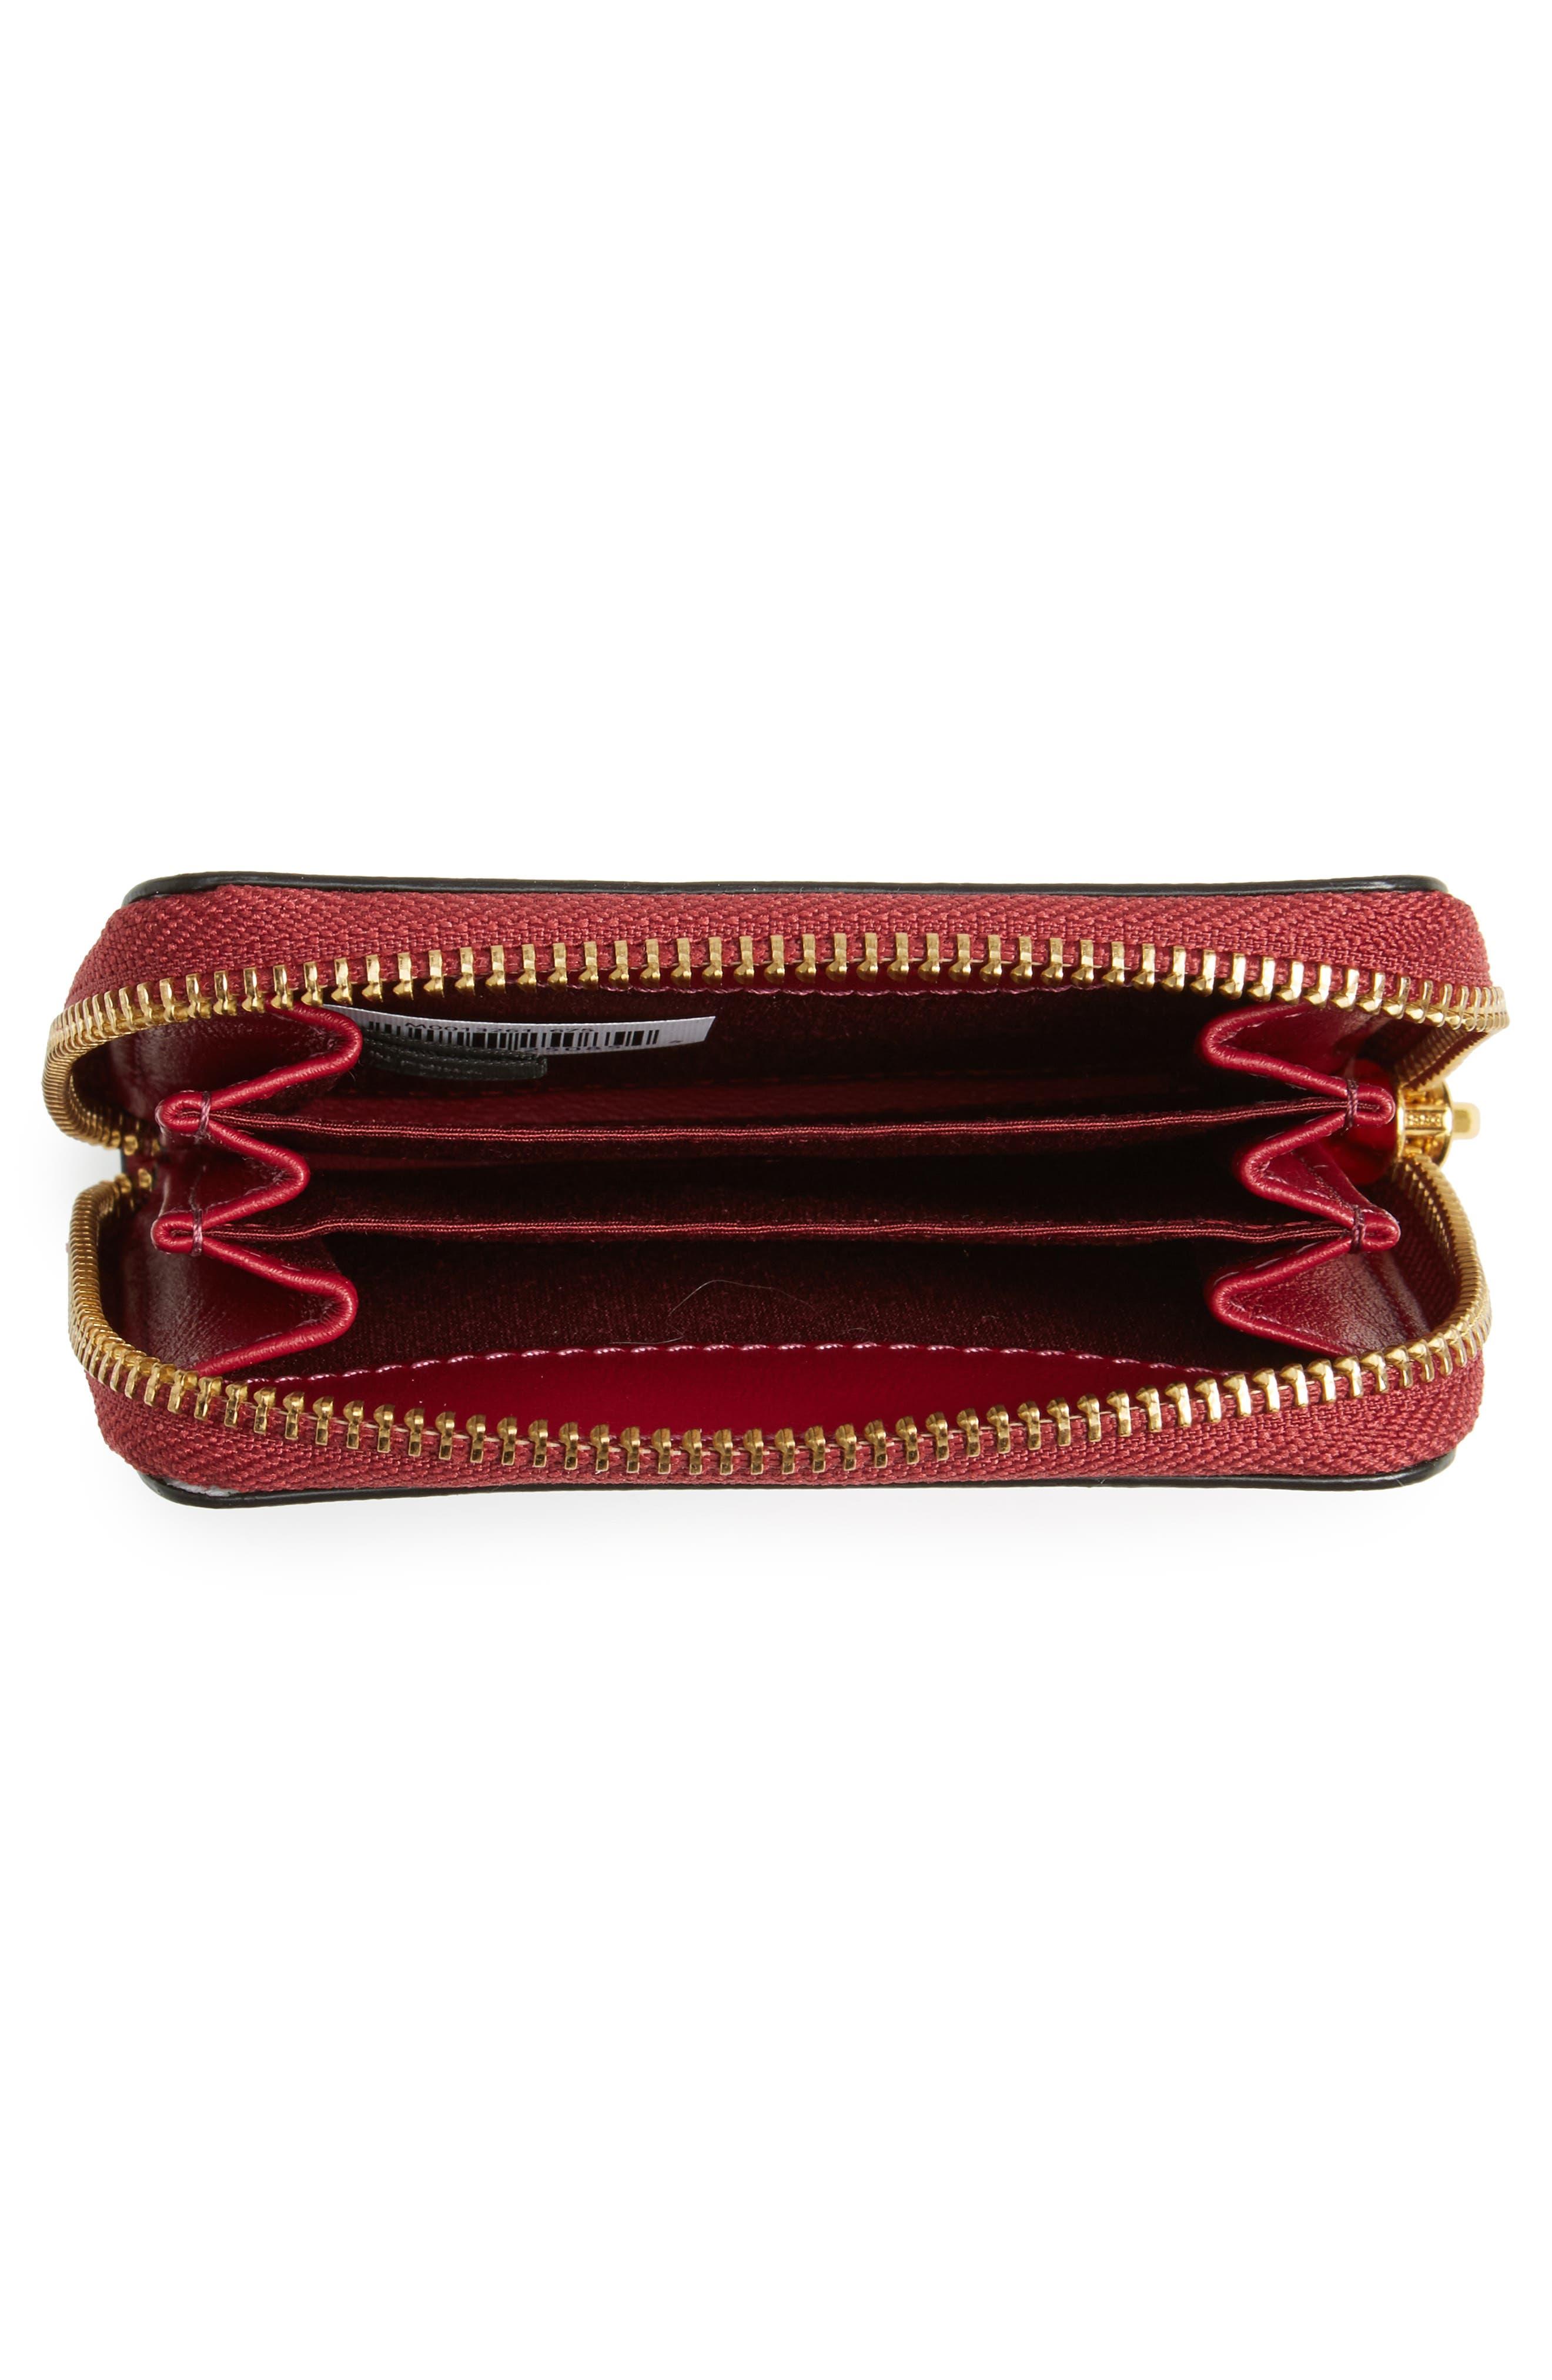 Lips Saffiano Leather Zip Around Wallet,                             Alternate thumbnail 2, color,                             Tea Rose Multi